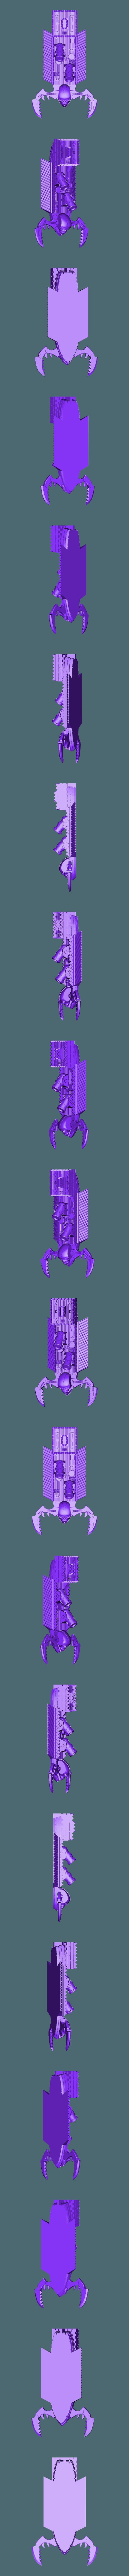 LordGonamCommandShipSingleMesh.stl Download free STL file GONAM Lord GONAM Command Ship proxy • 3D printer design, barnEbiss2